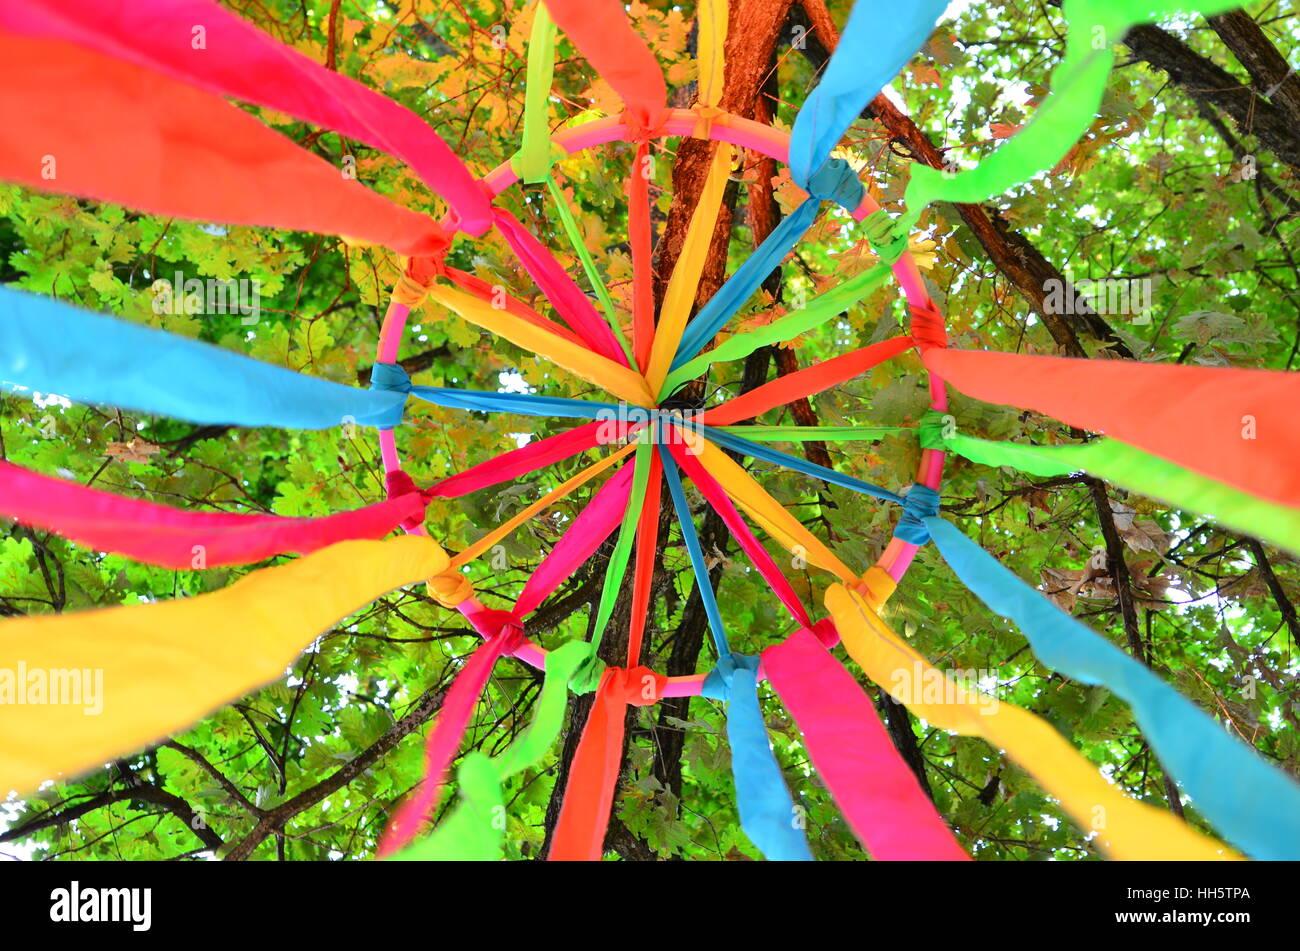 Rainbow of colors - Stock Image